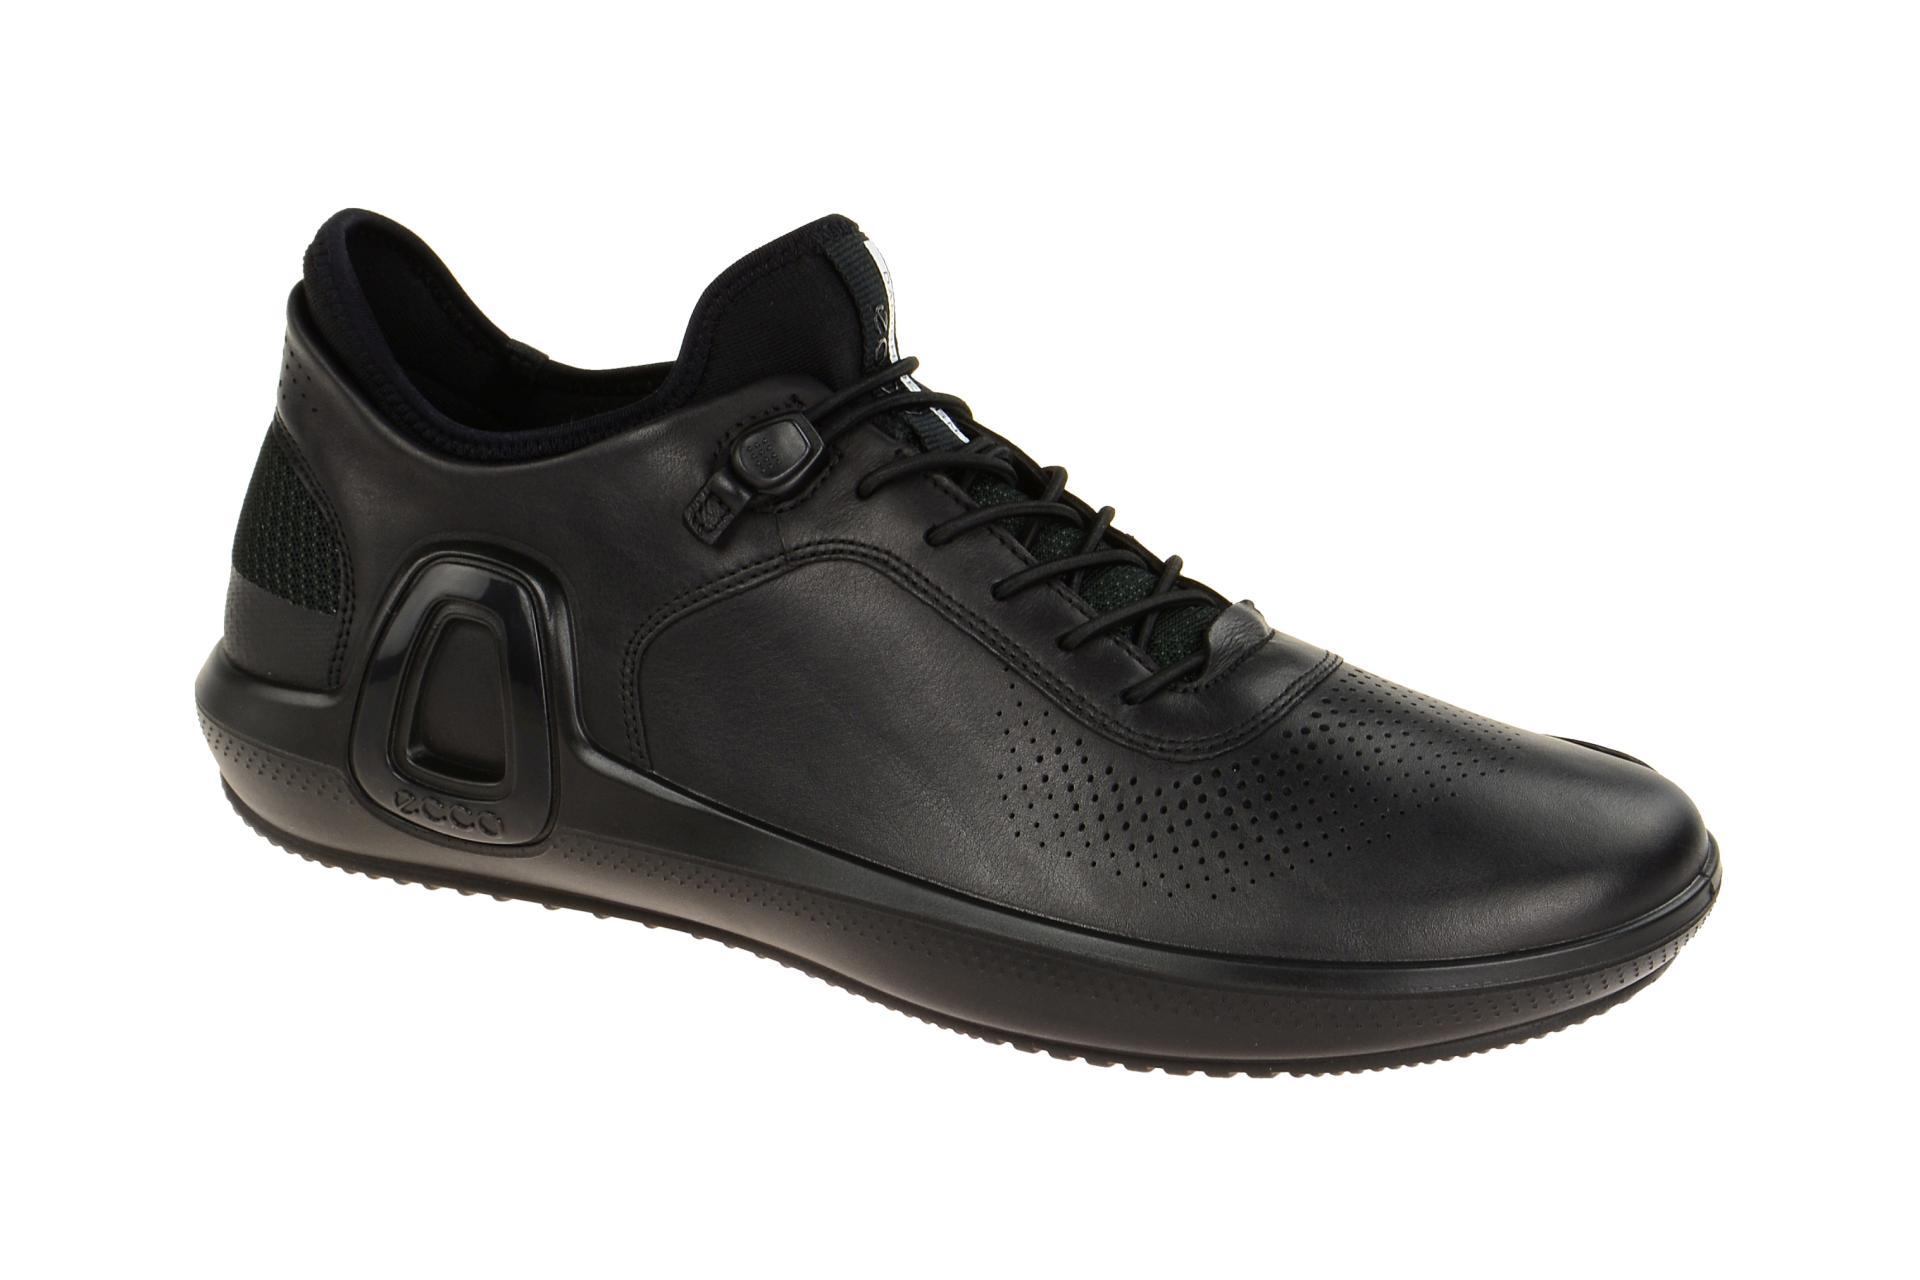 dde7c8fbd2c216 Ecco Schuhe INTRINSIC 3 schwarz Herrenschuhe Sneakers 83955401001 ...